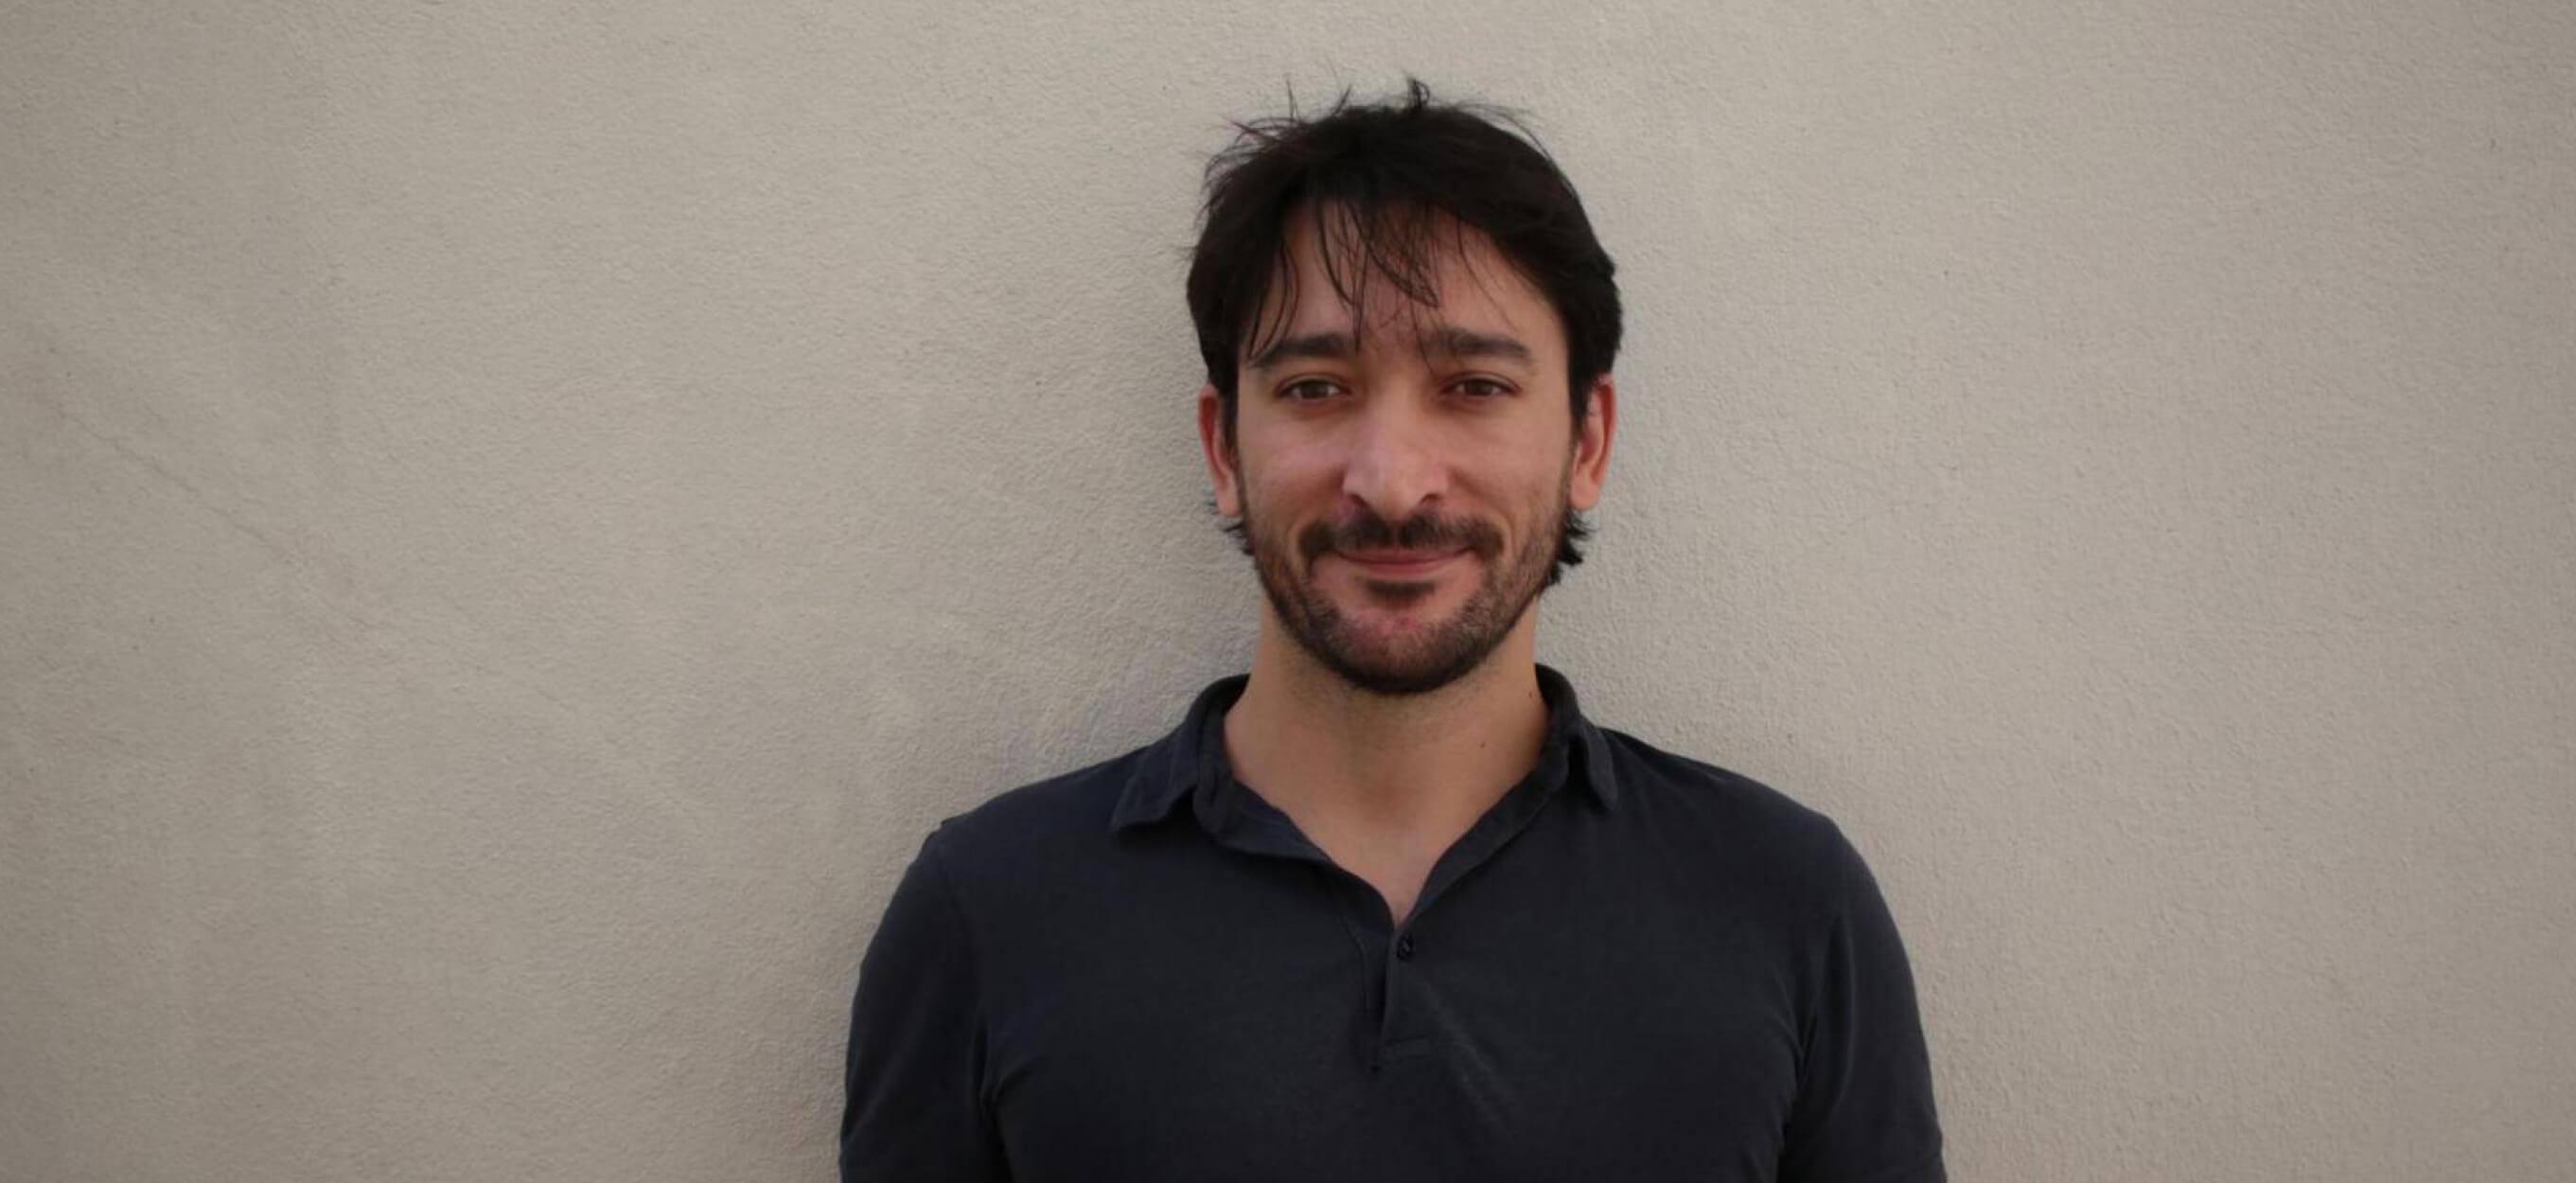 Yoann Moranville, OPERAS new technical coordinator